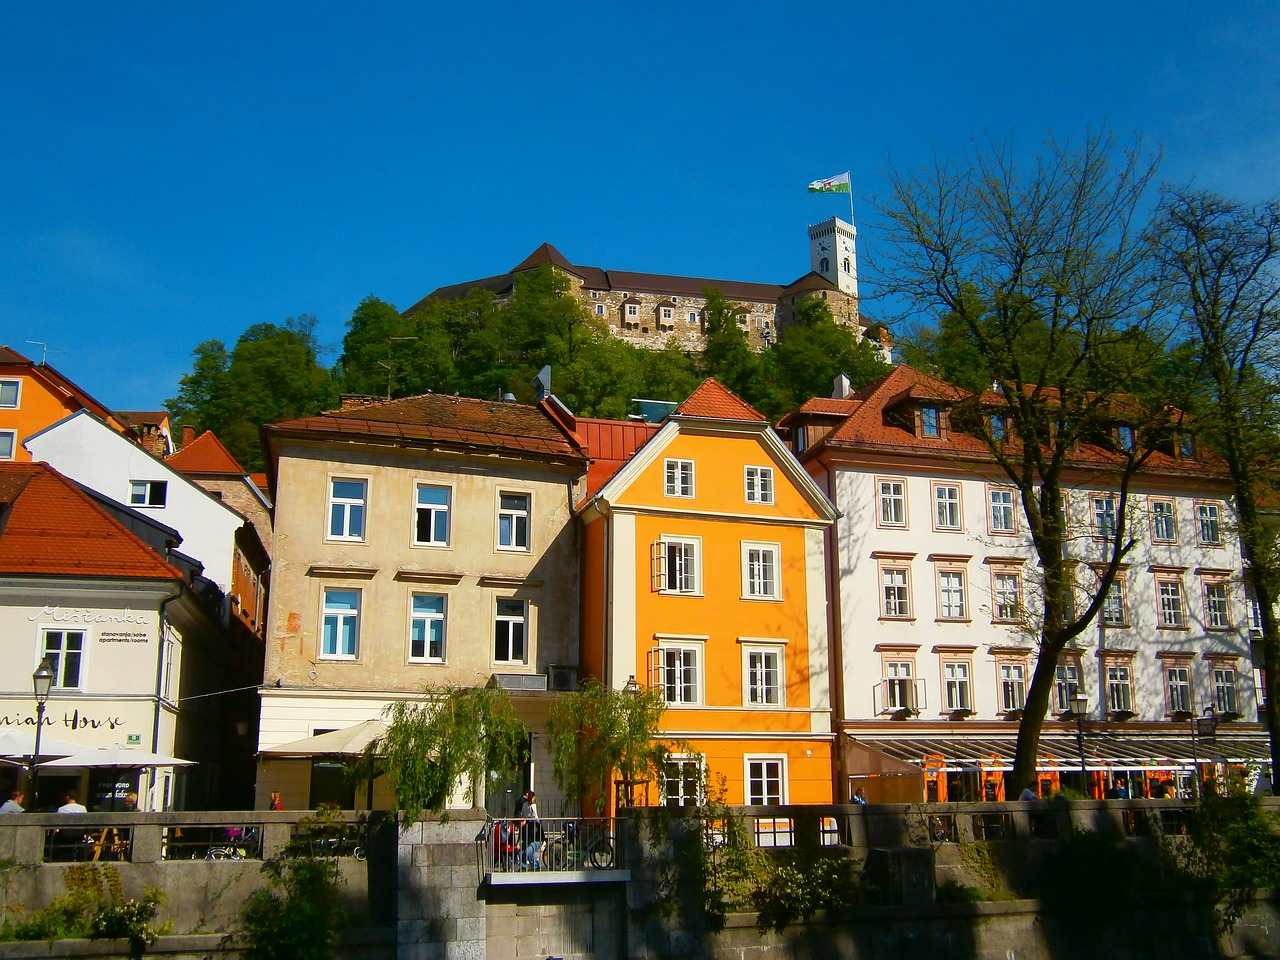 a stroll down the beautiful city of ljubljana the capital of slovenia